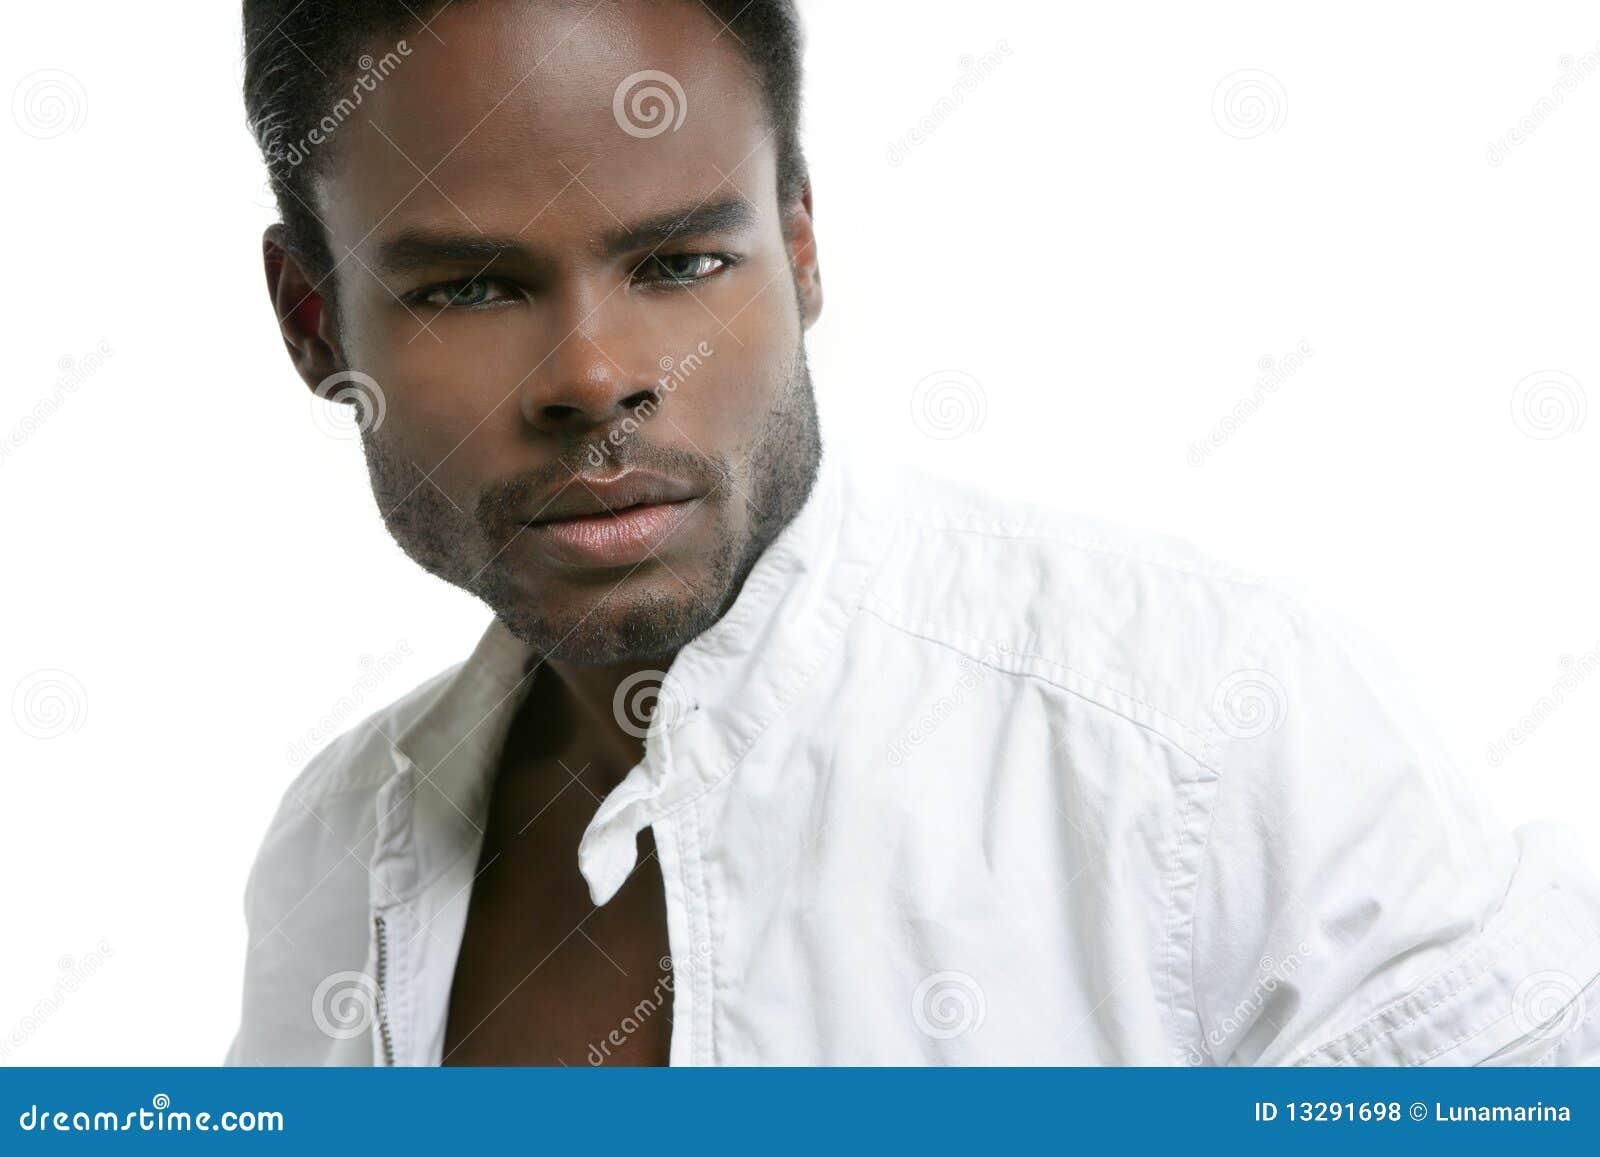 3 Dicas Pra Perder peso Se Divertindo retrato-preto-bonito-do-homem-novo-de-americano-africano-13291698